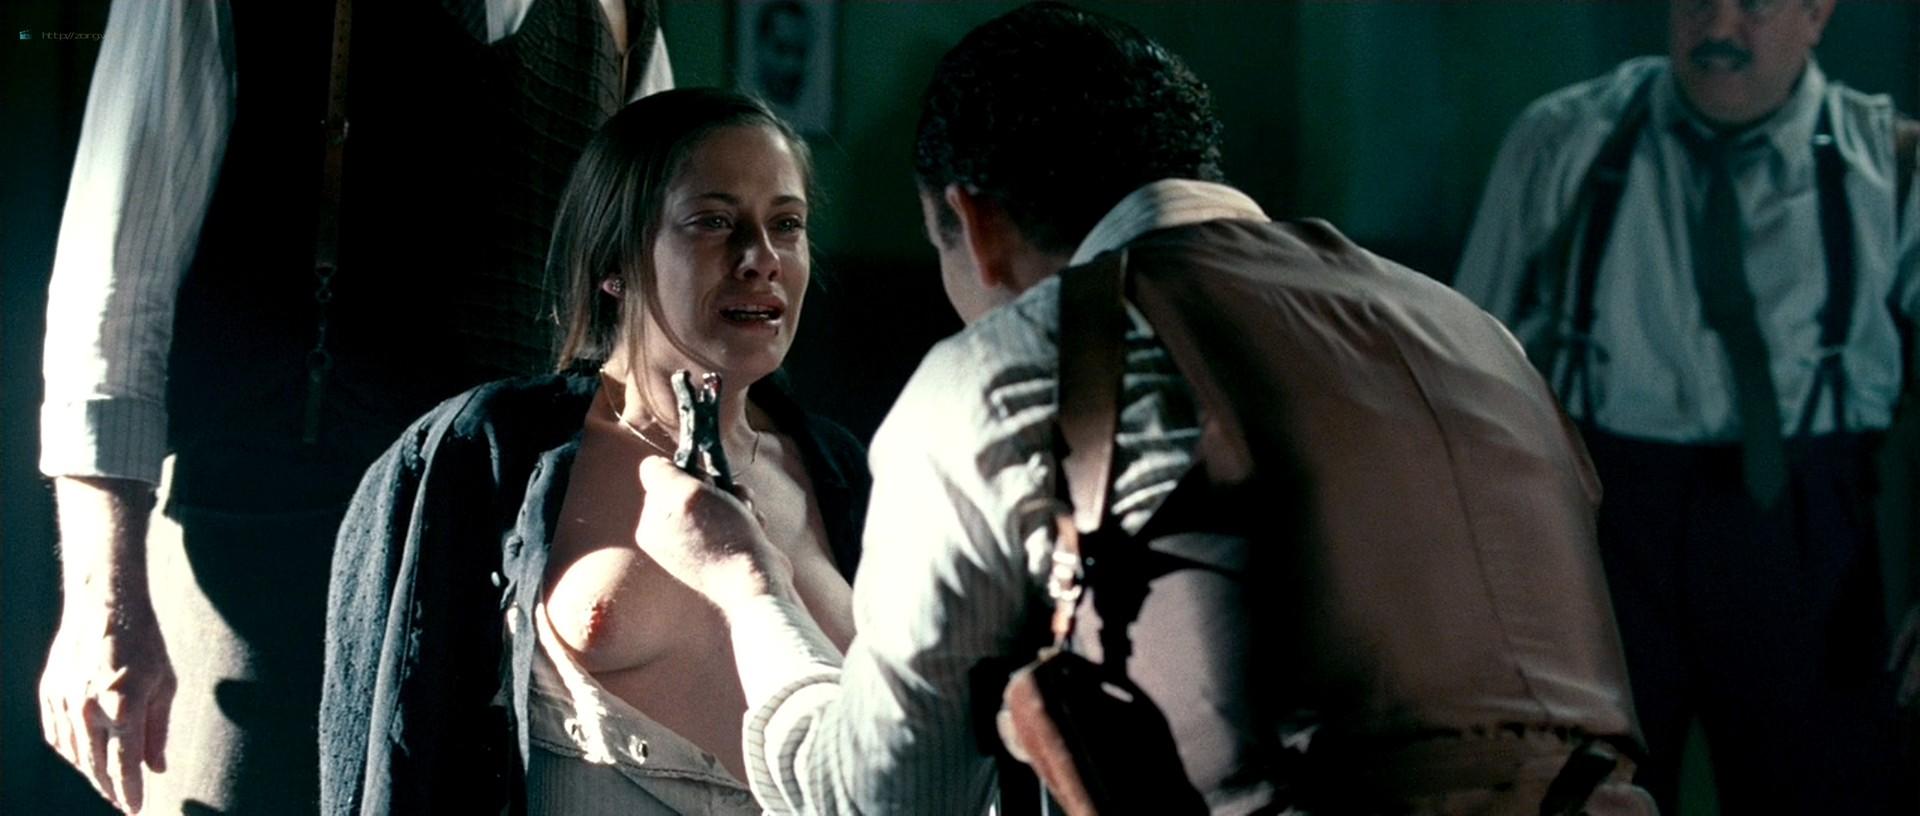 Maria Leon nude in - La voz dormida (2011) HD 1080p BluRay (8)